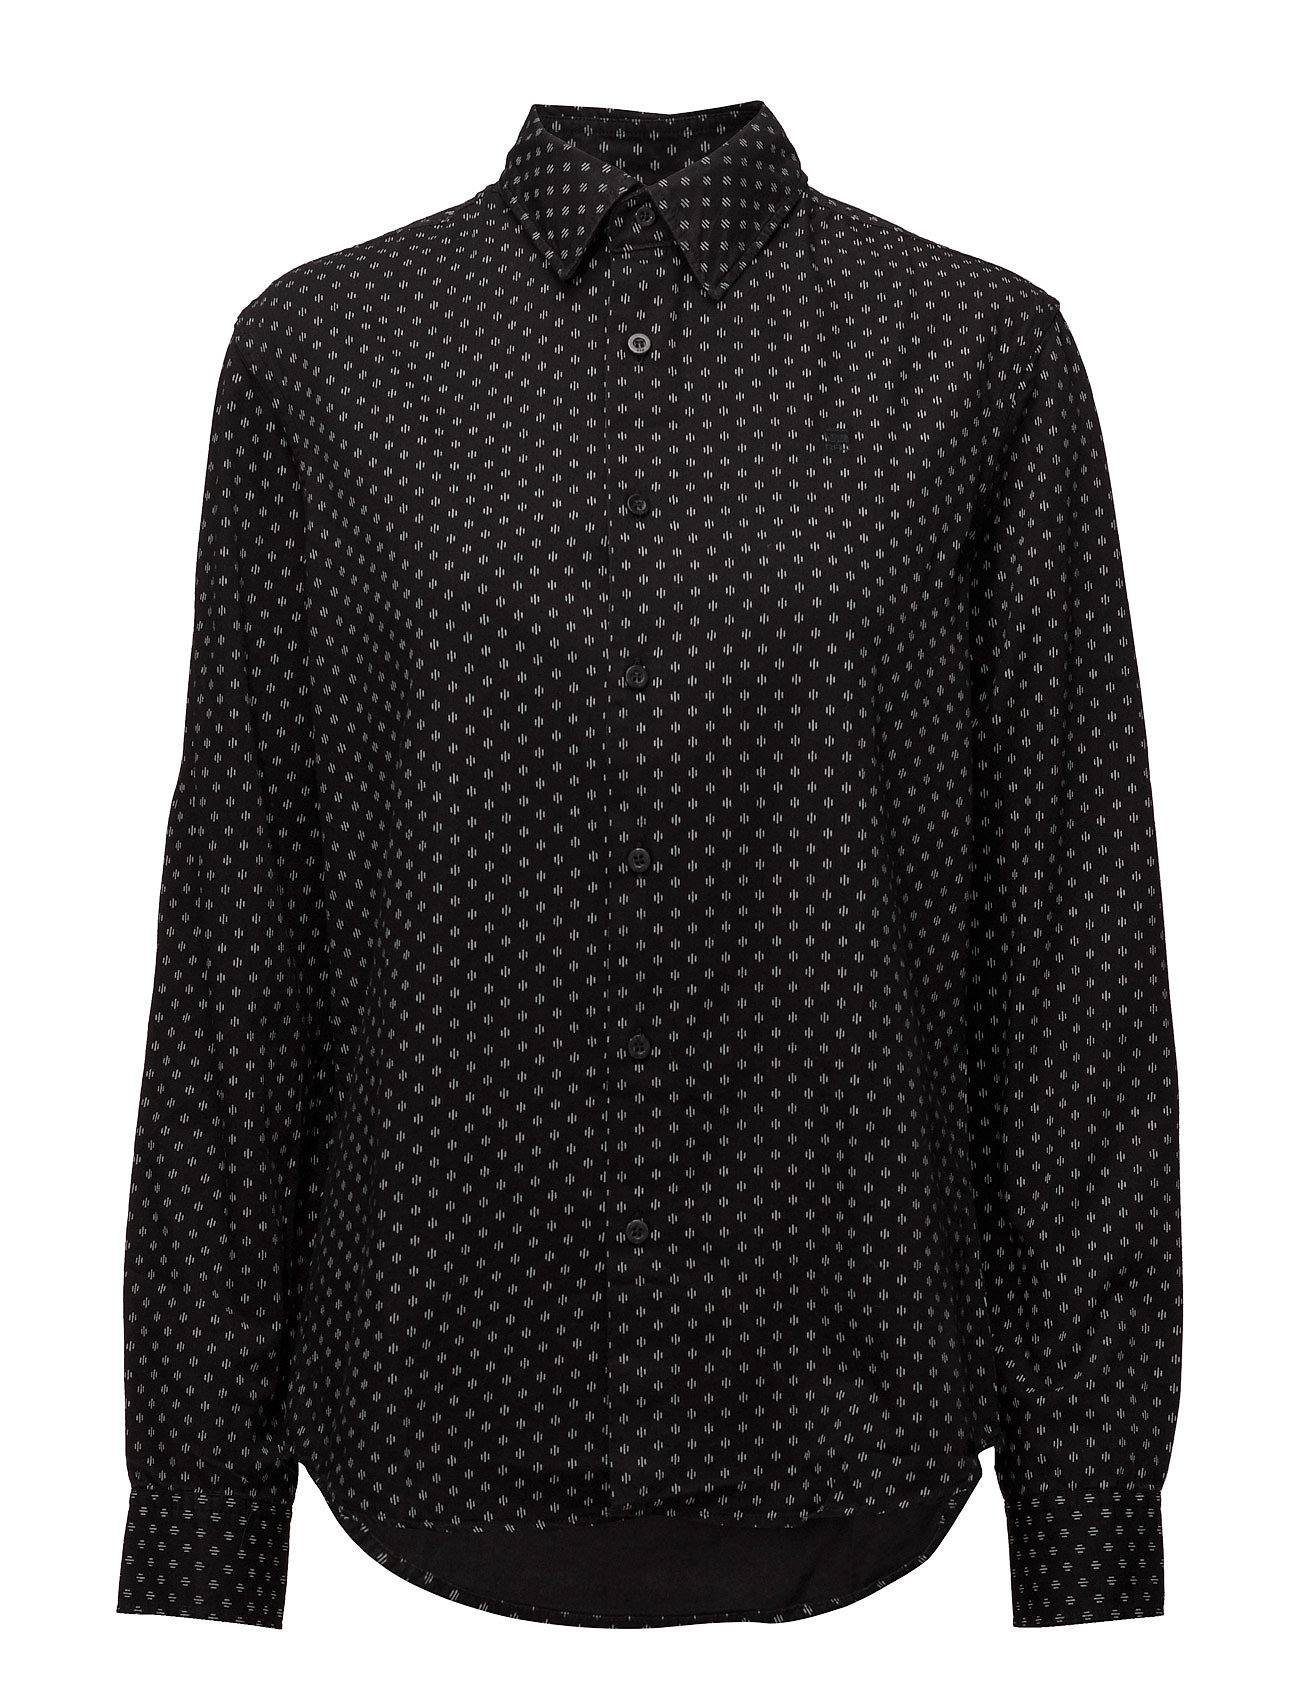 g-star Core shirt l på boozt.com dk